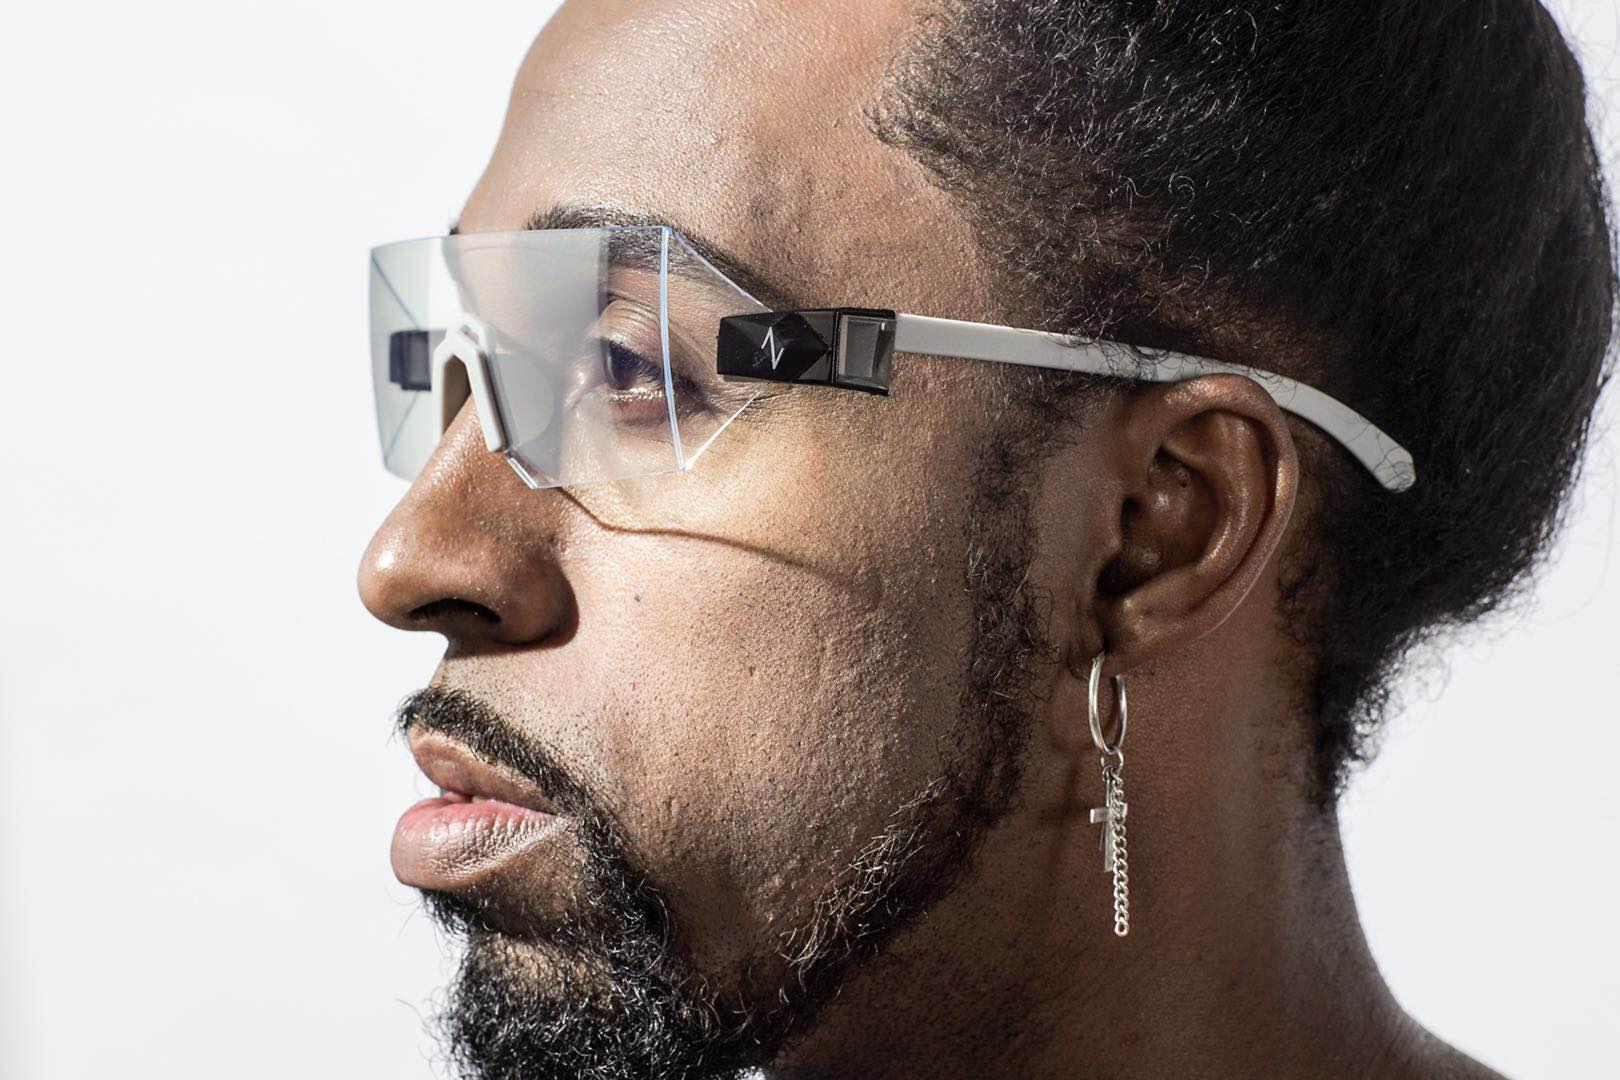 Zedot's gamer glasses (Image Credit: Zedot)